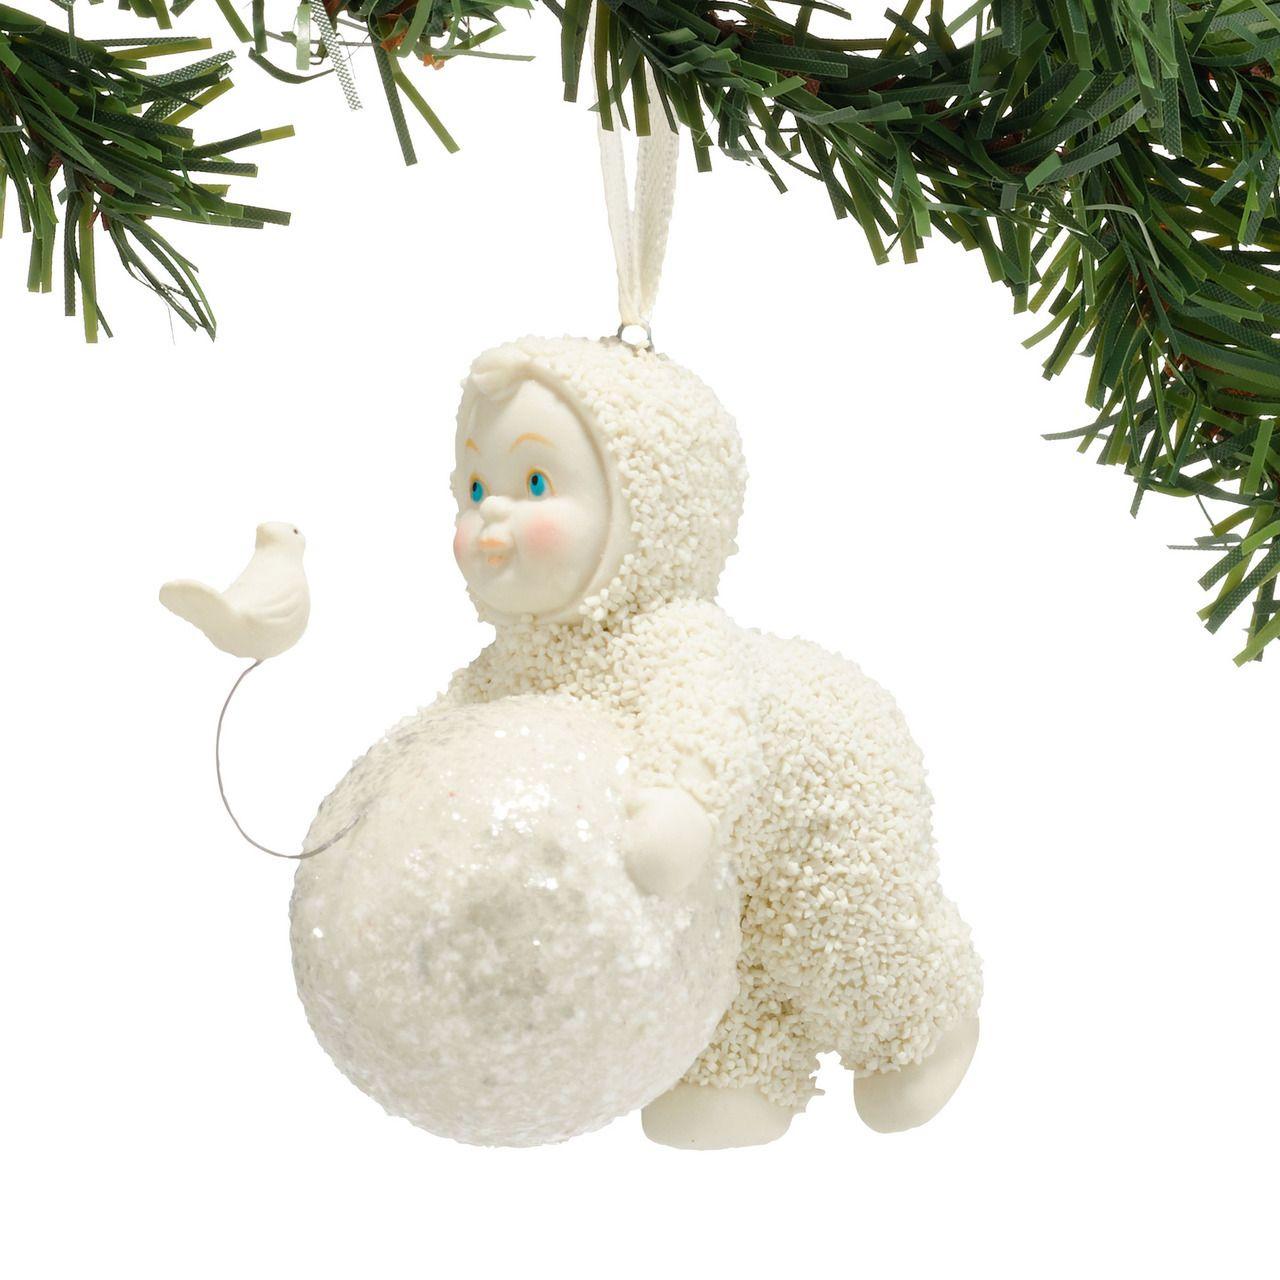 Snowbaby ornaments - Snowbabies Let S Build A Snowman Ornament Always Forever